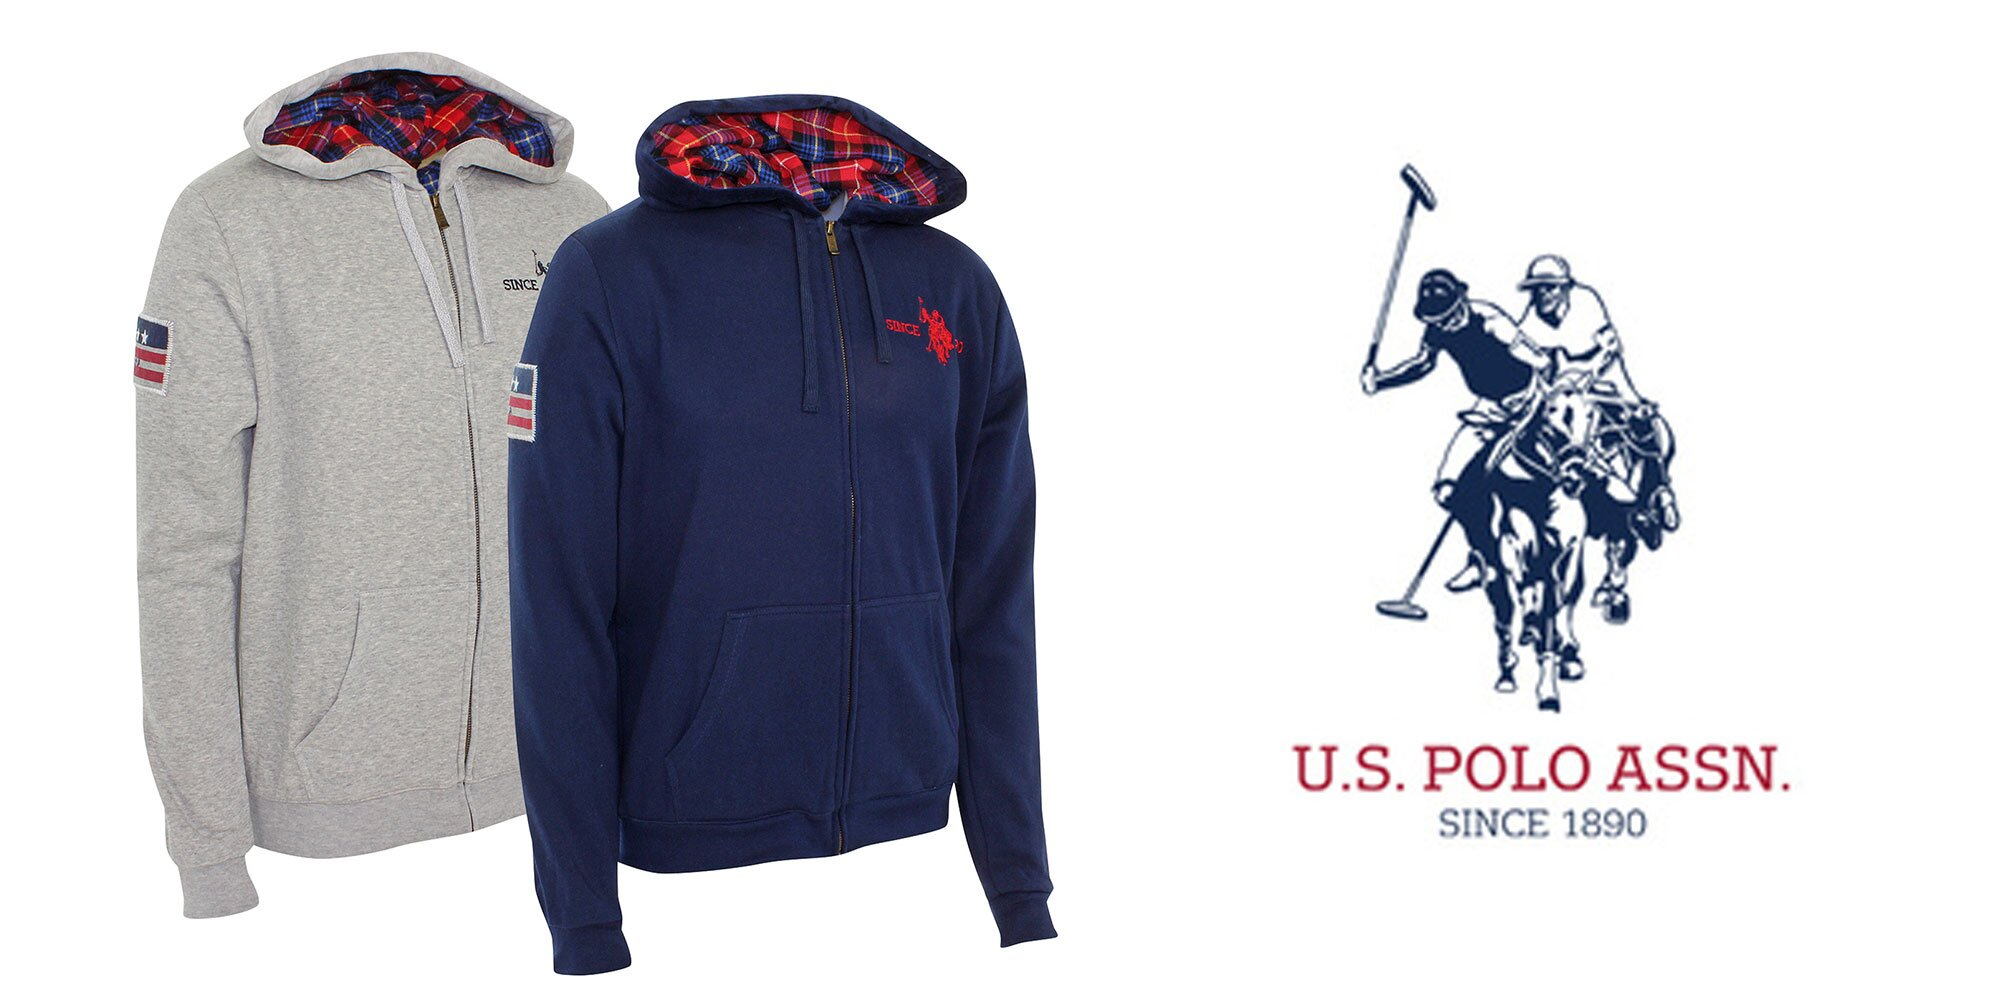 0fc22d6331c1 Pánska štýlová mikina U. S. Polo Assn